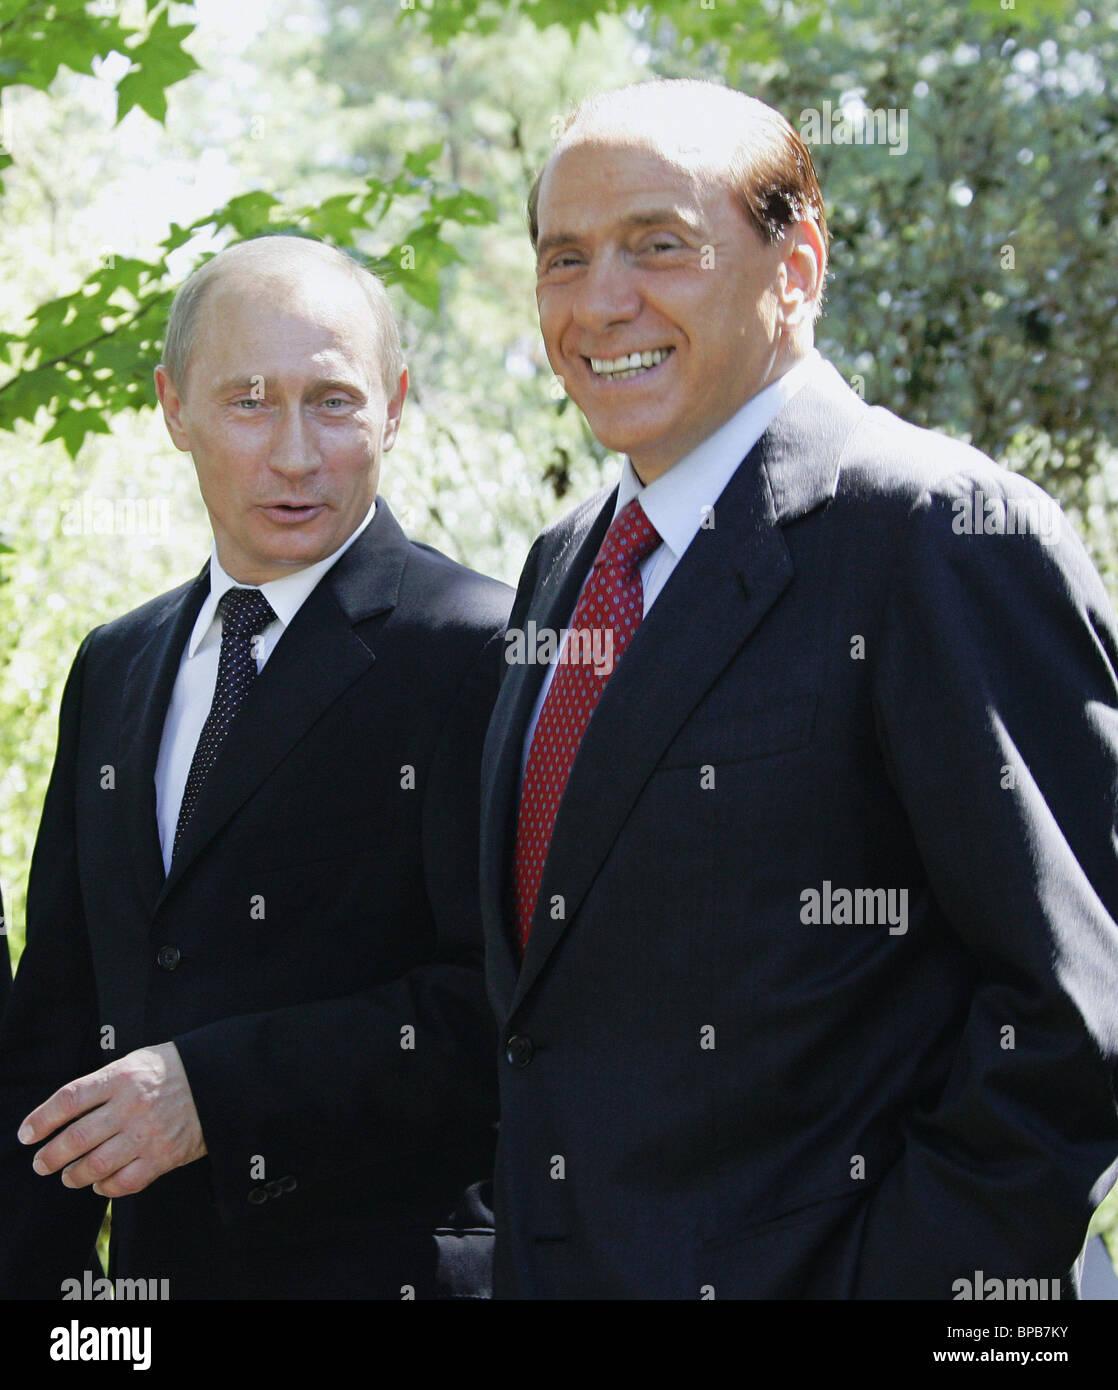 Russian President Vladimir Putin meets with Italian Prime Minister Silvio Berlusconi in Sochi - Stock Image